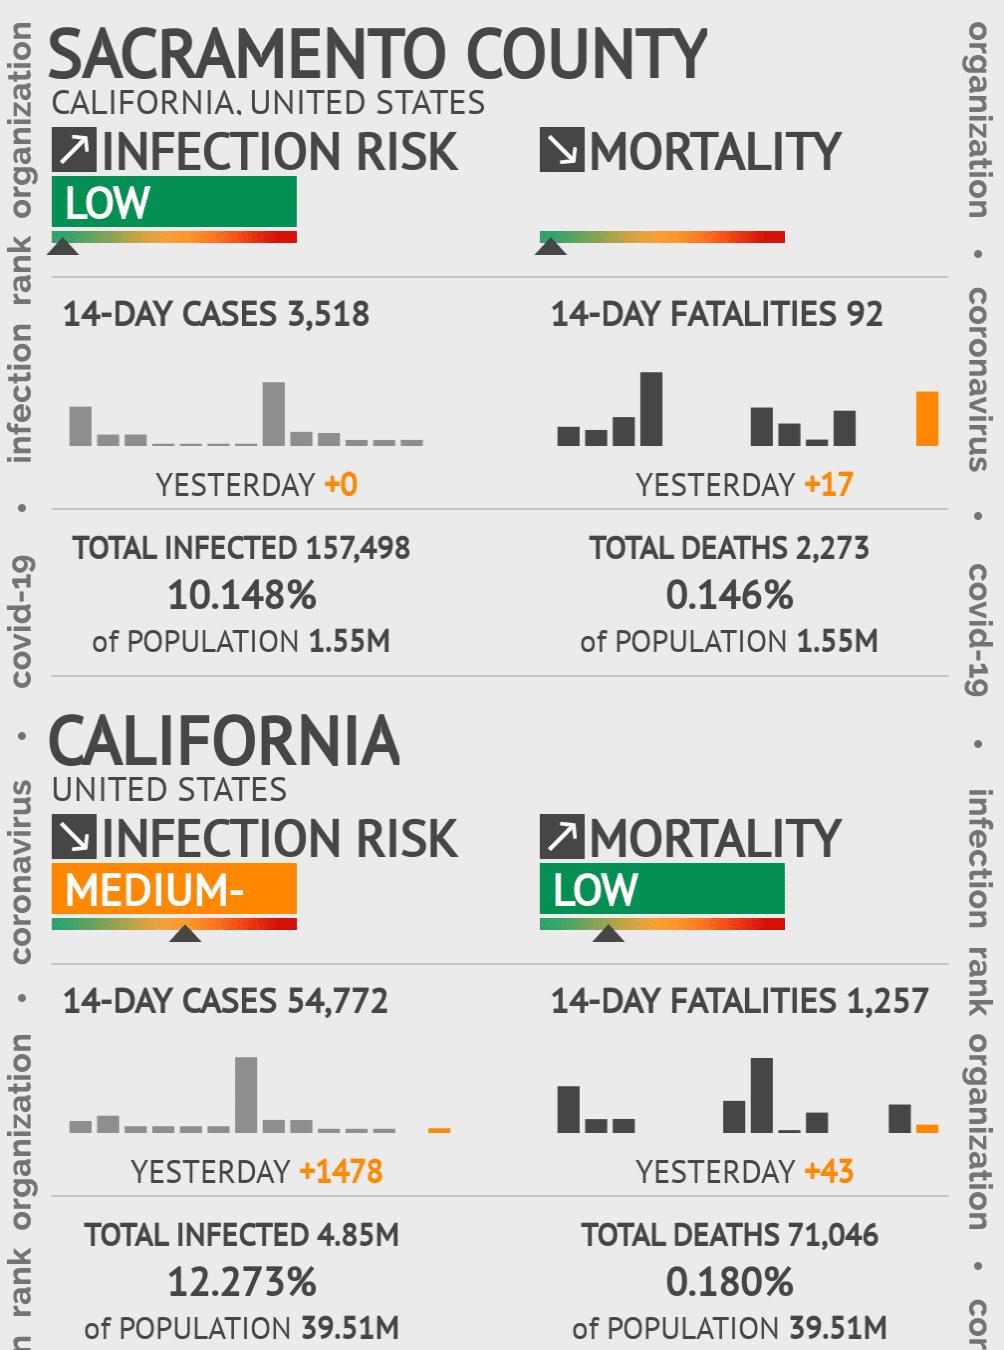 Sacramento County Coronavirus Covid-19 Risk of Infection on December 02, 2020